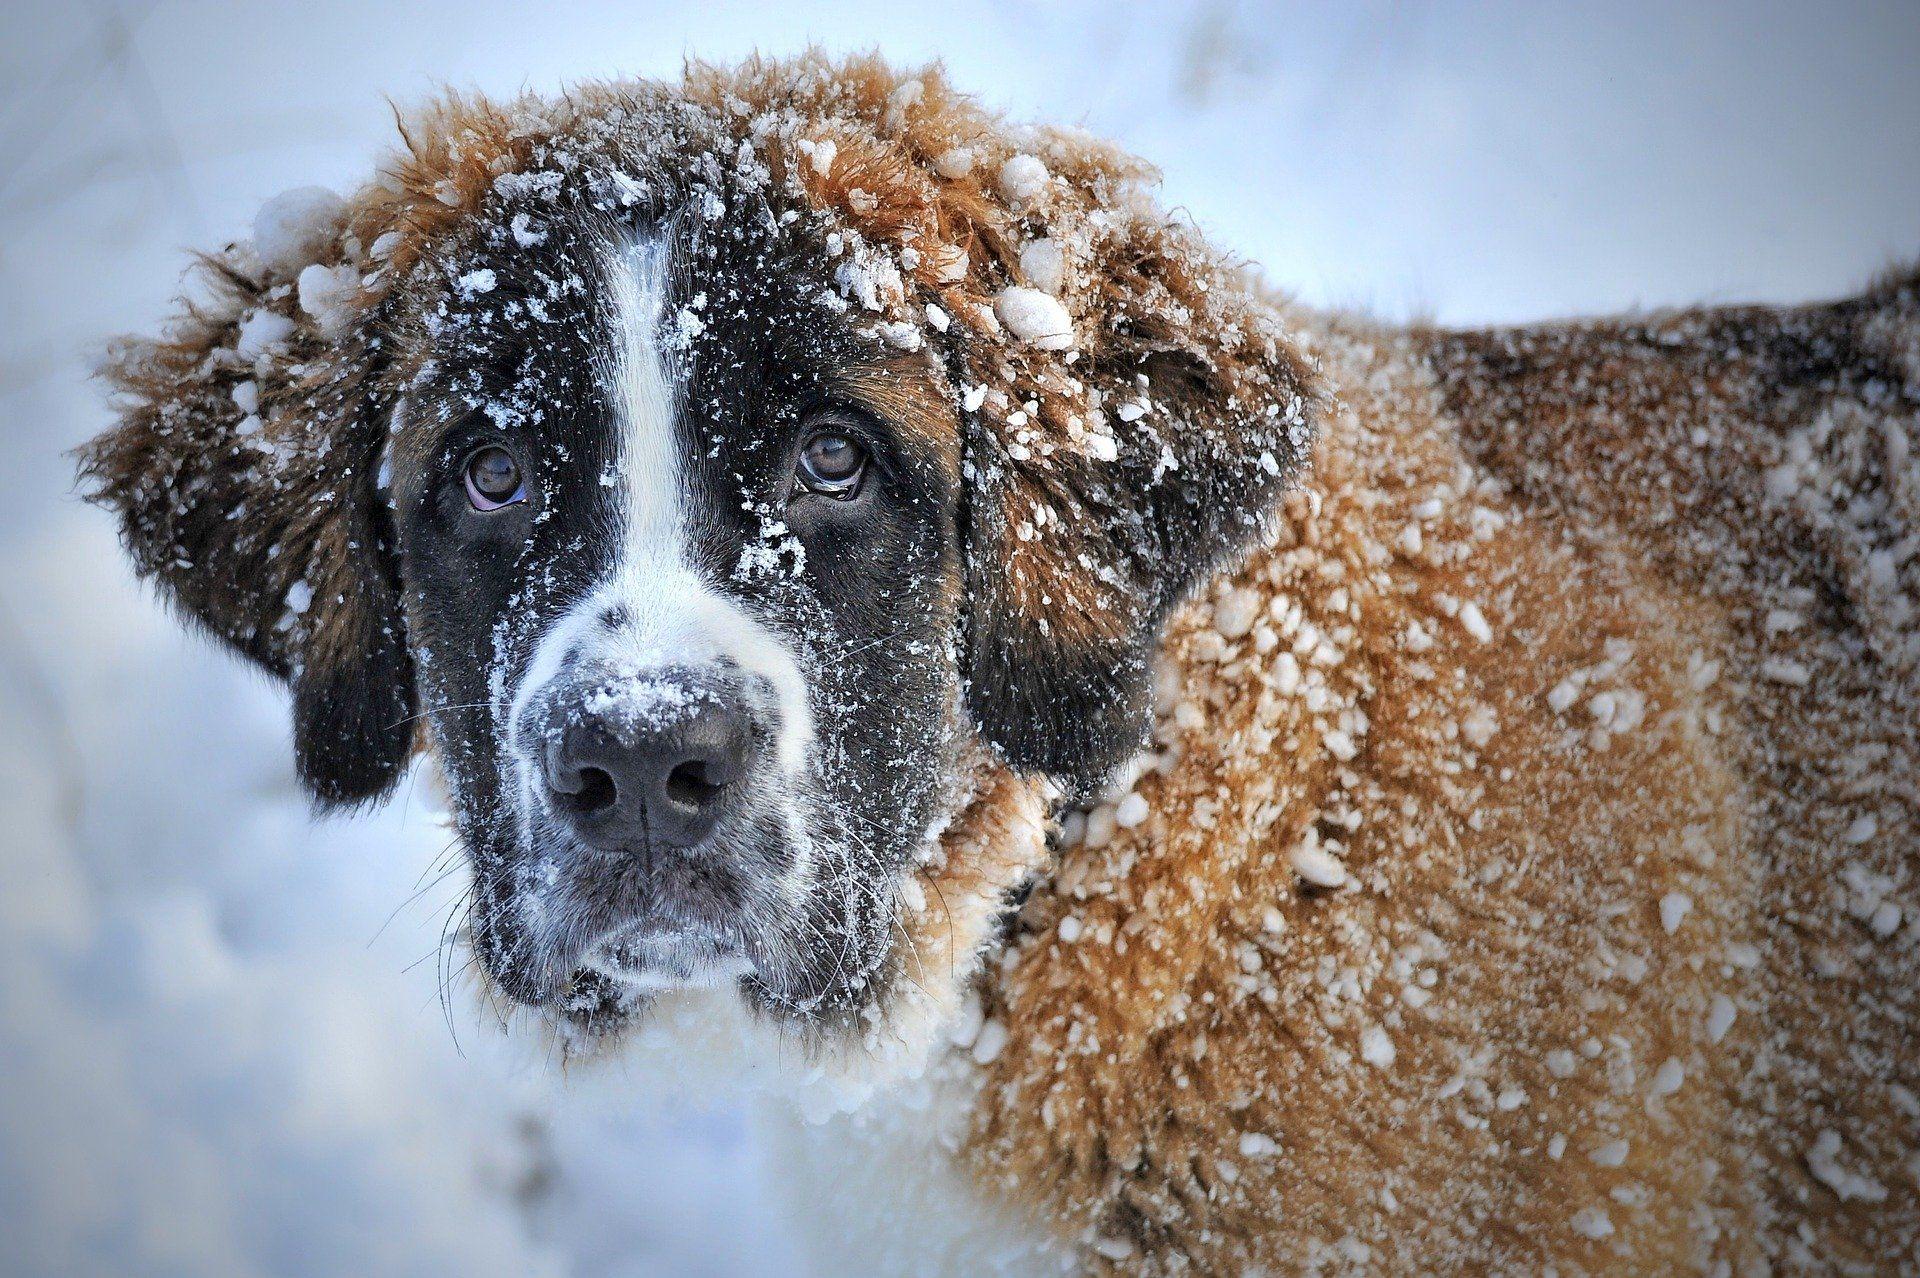 Картинка породы крупных собак - сенбернар